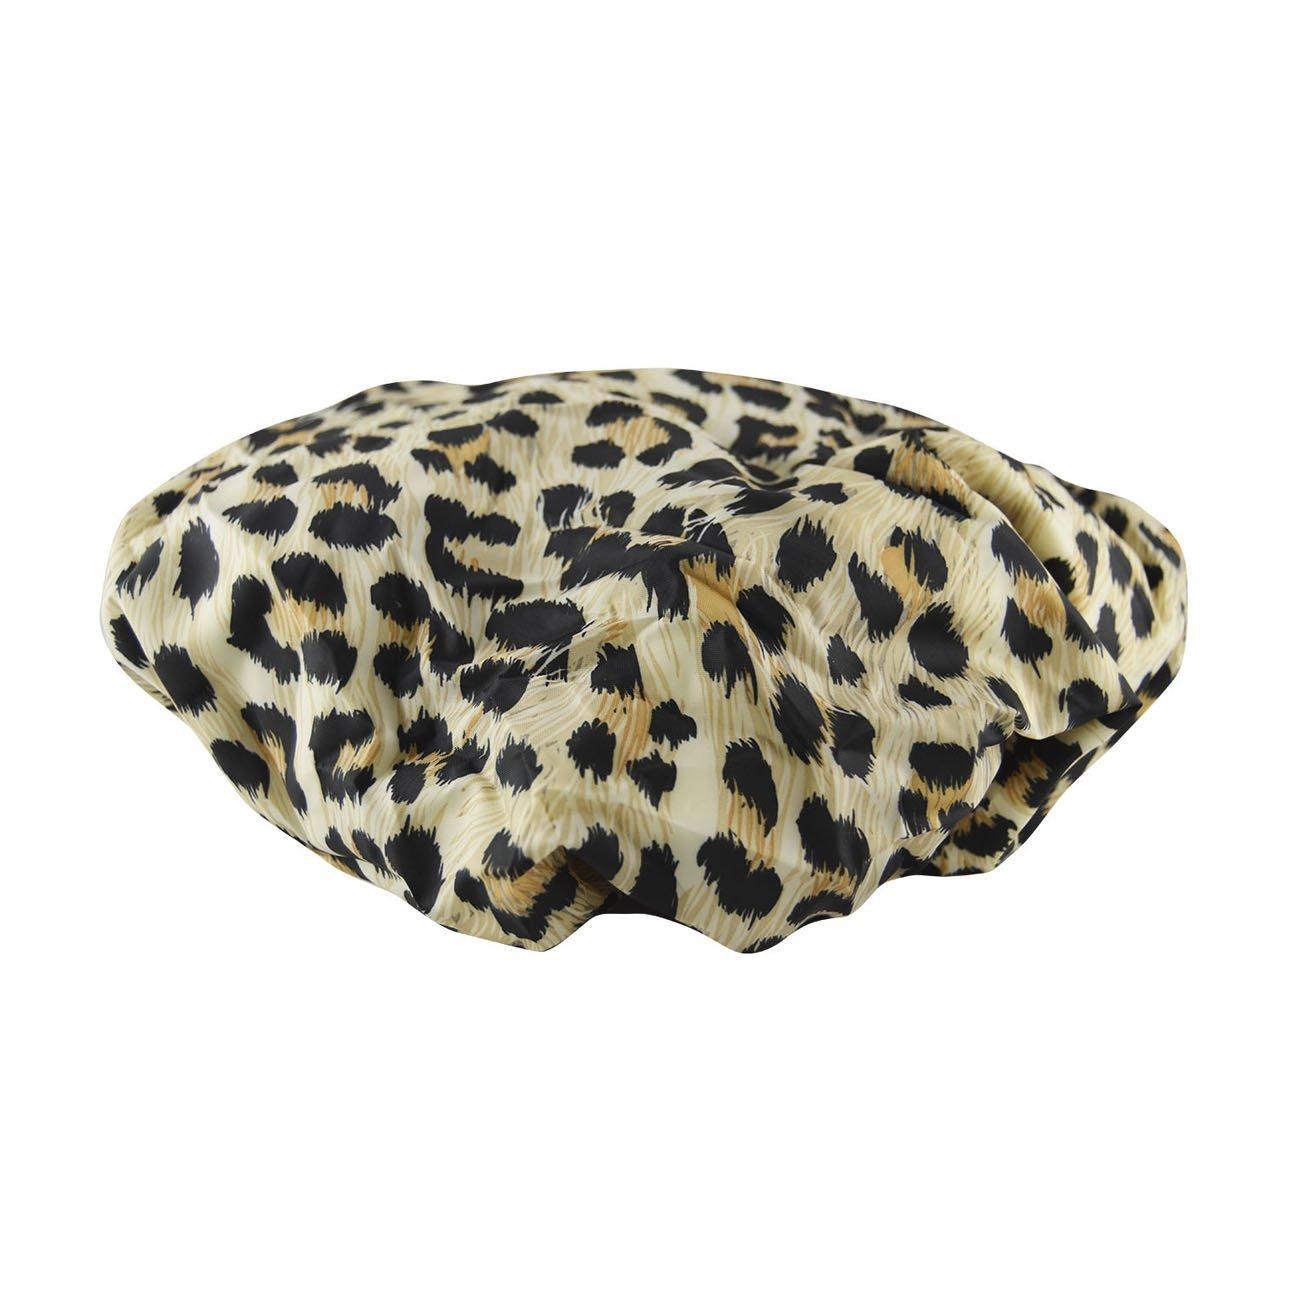 Betty Dain Socialite Collection Terry Lined Shower Cap, Waterproof Nylon Exterior, Reversible Design for Shower or Sleeping Cap, Oversized for All Hair Lengths, Elasticized Hem, Safari Spots : Beauty